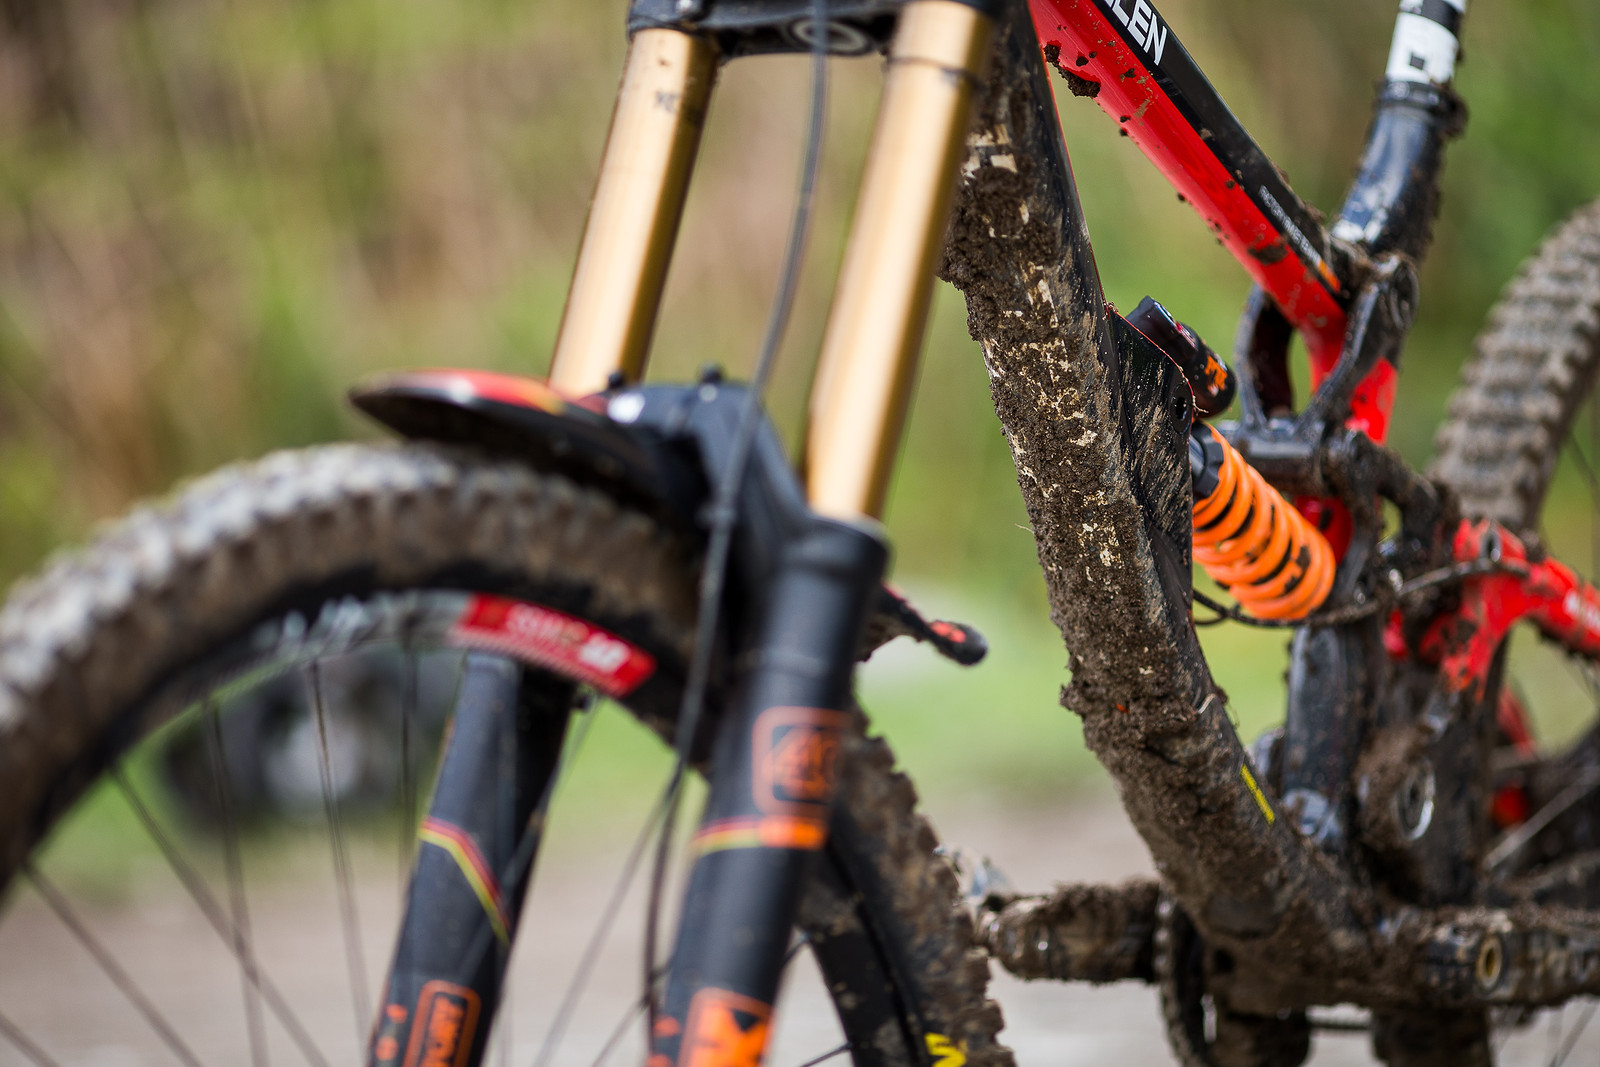 FOX DHX2 Coil Shock - WINNING BIKE: Matt Walker's Saracen Myst - Mountain Biking Pictures - Vital MTB